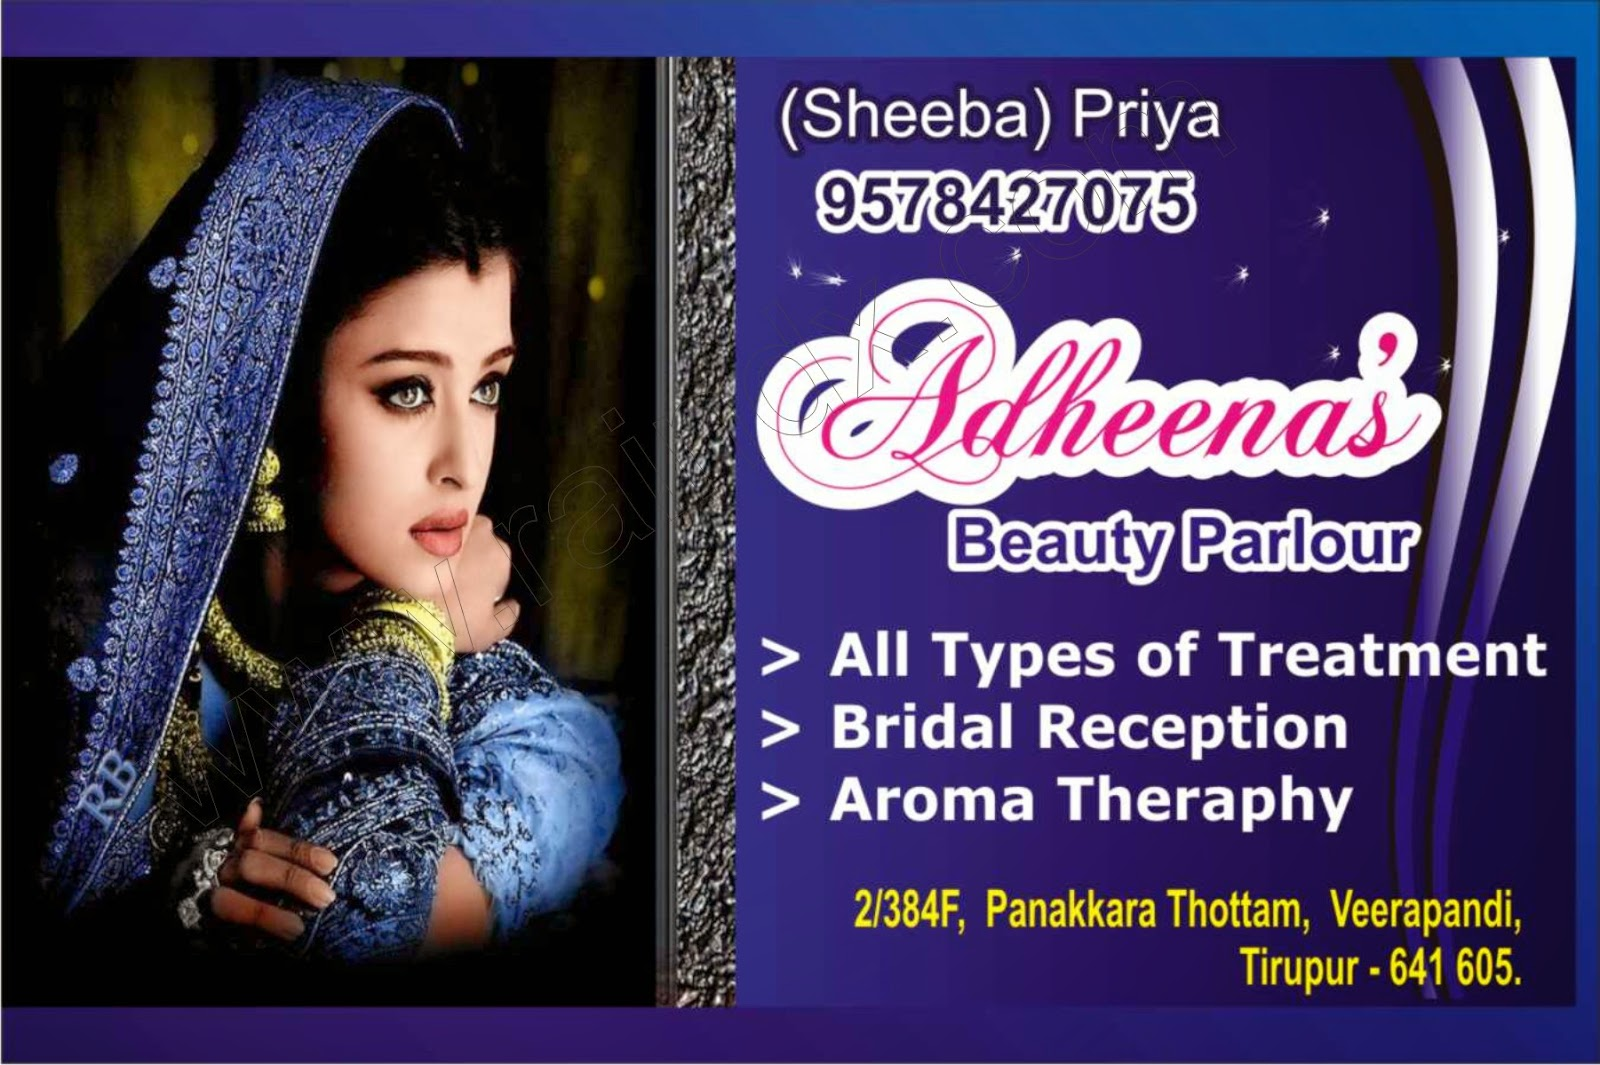 Parlour Business Card Adheenas Beauty Parlour Rain Digital